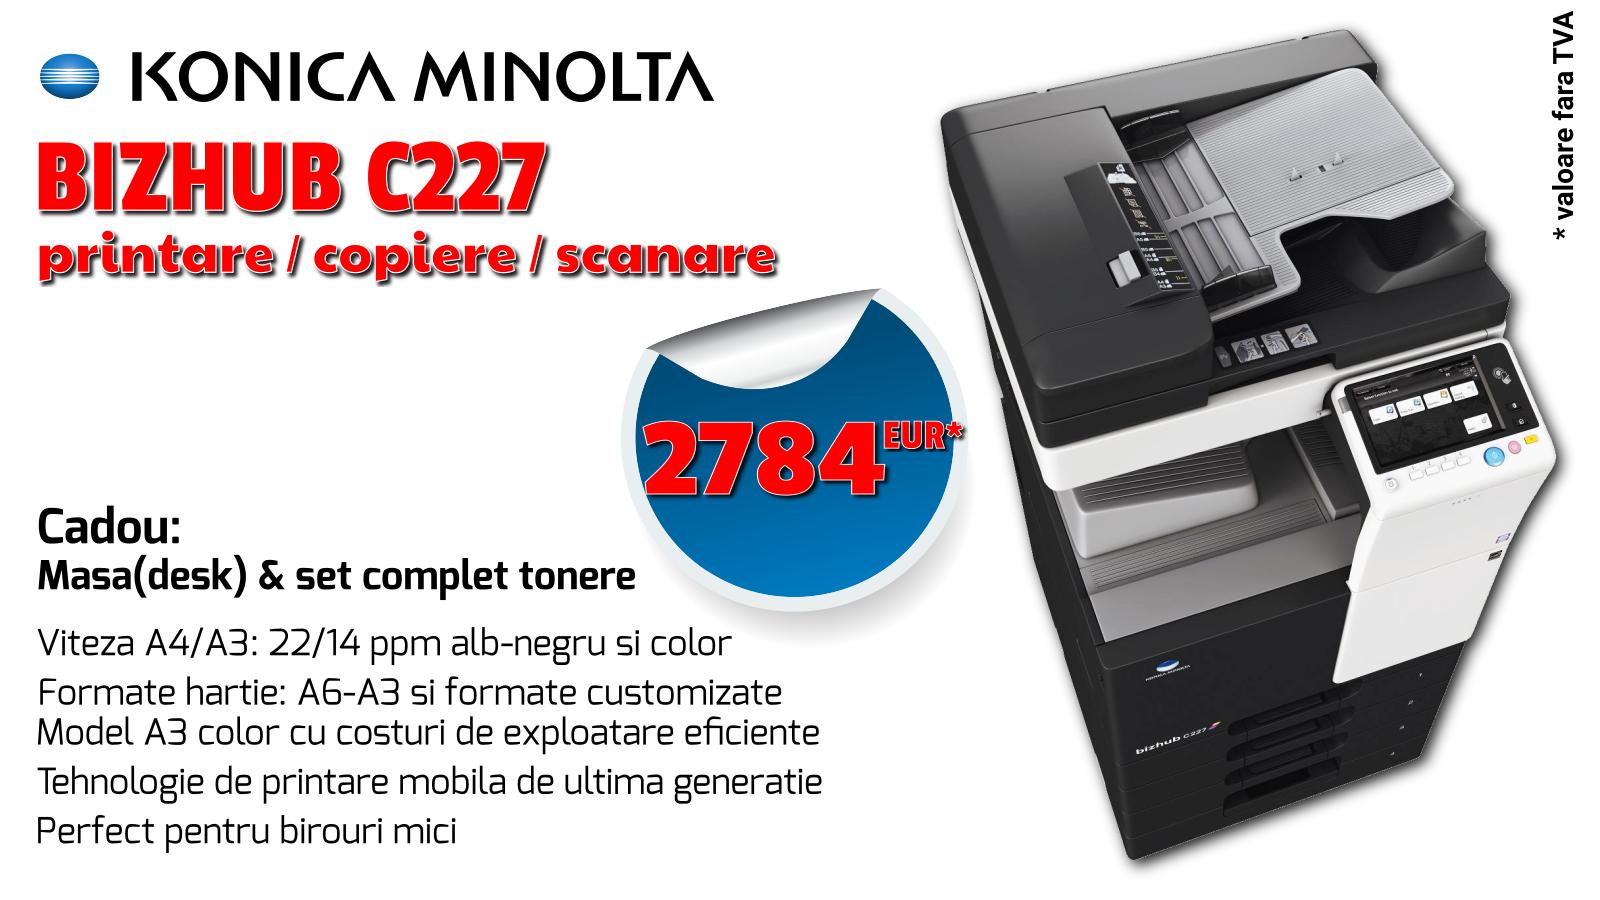 Promotii vanzare echipamente de printare, imprimante laser si multifunctionale prin Romsystem.ro - Konica Minolta Bizhub C227